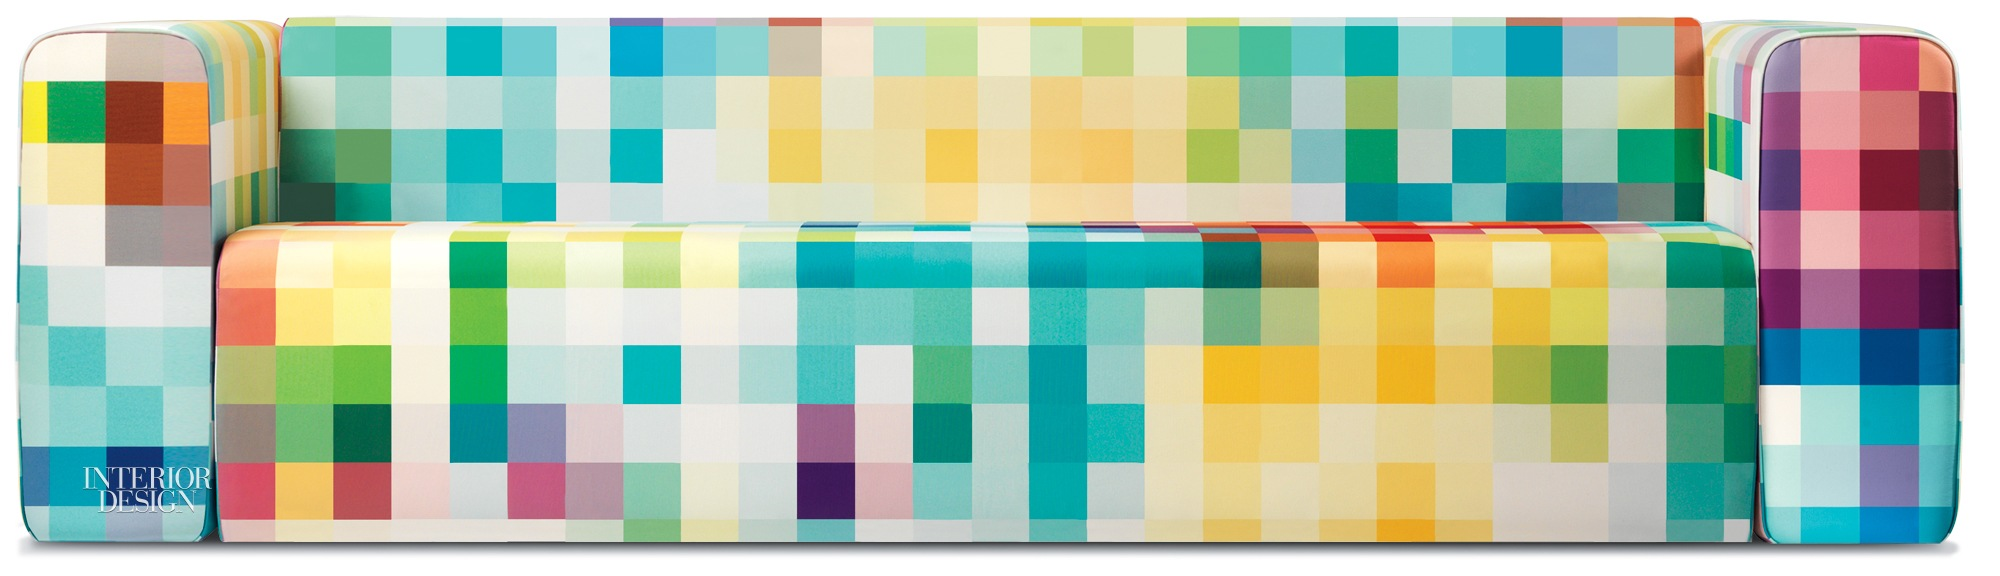 Cristian Zuzunaga Clads Sofas in One-of-a-Kind Pixel Fabric